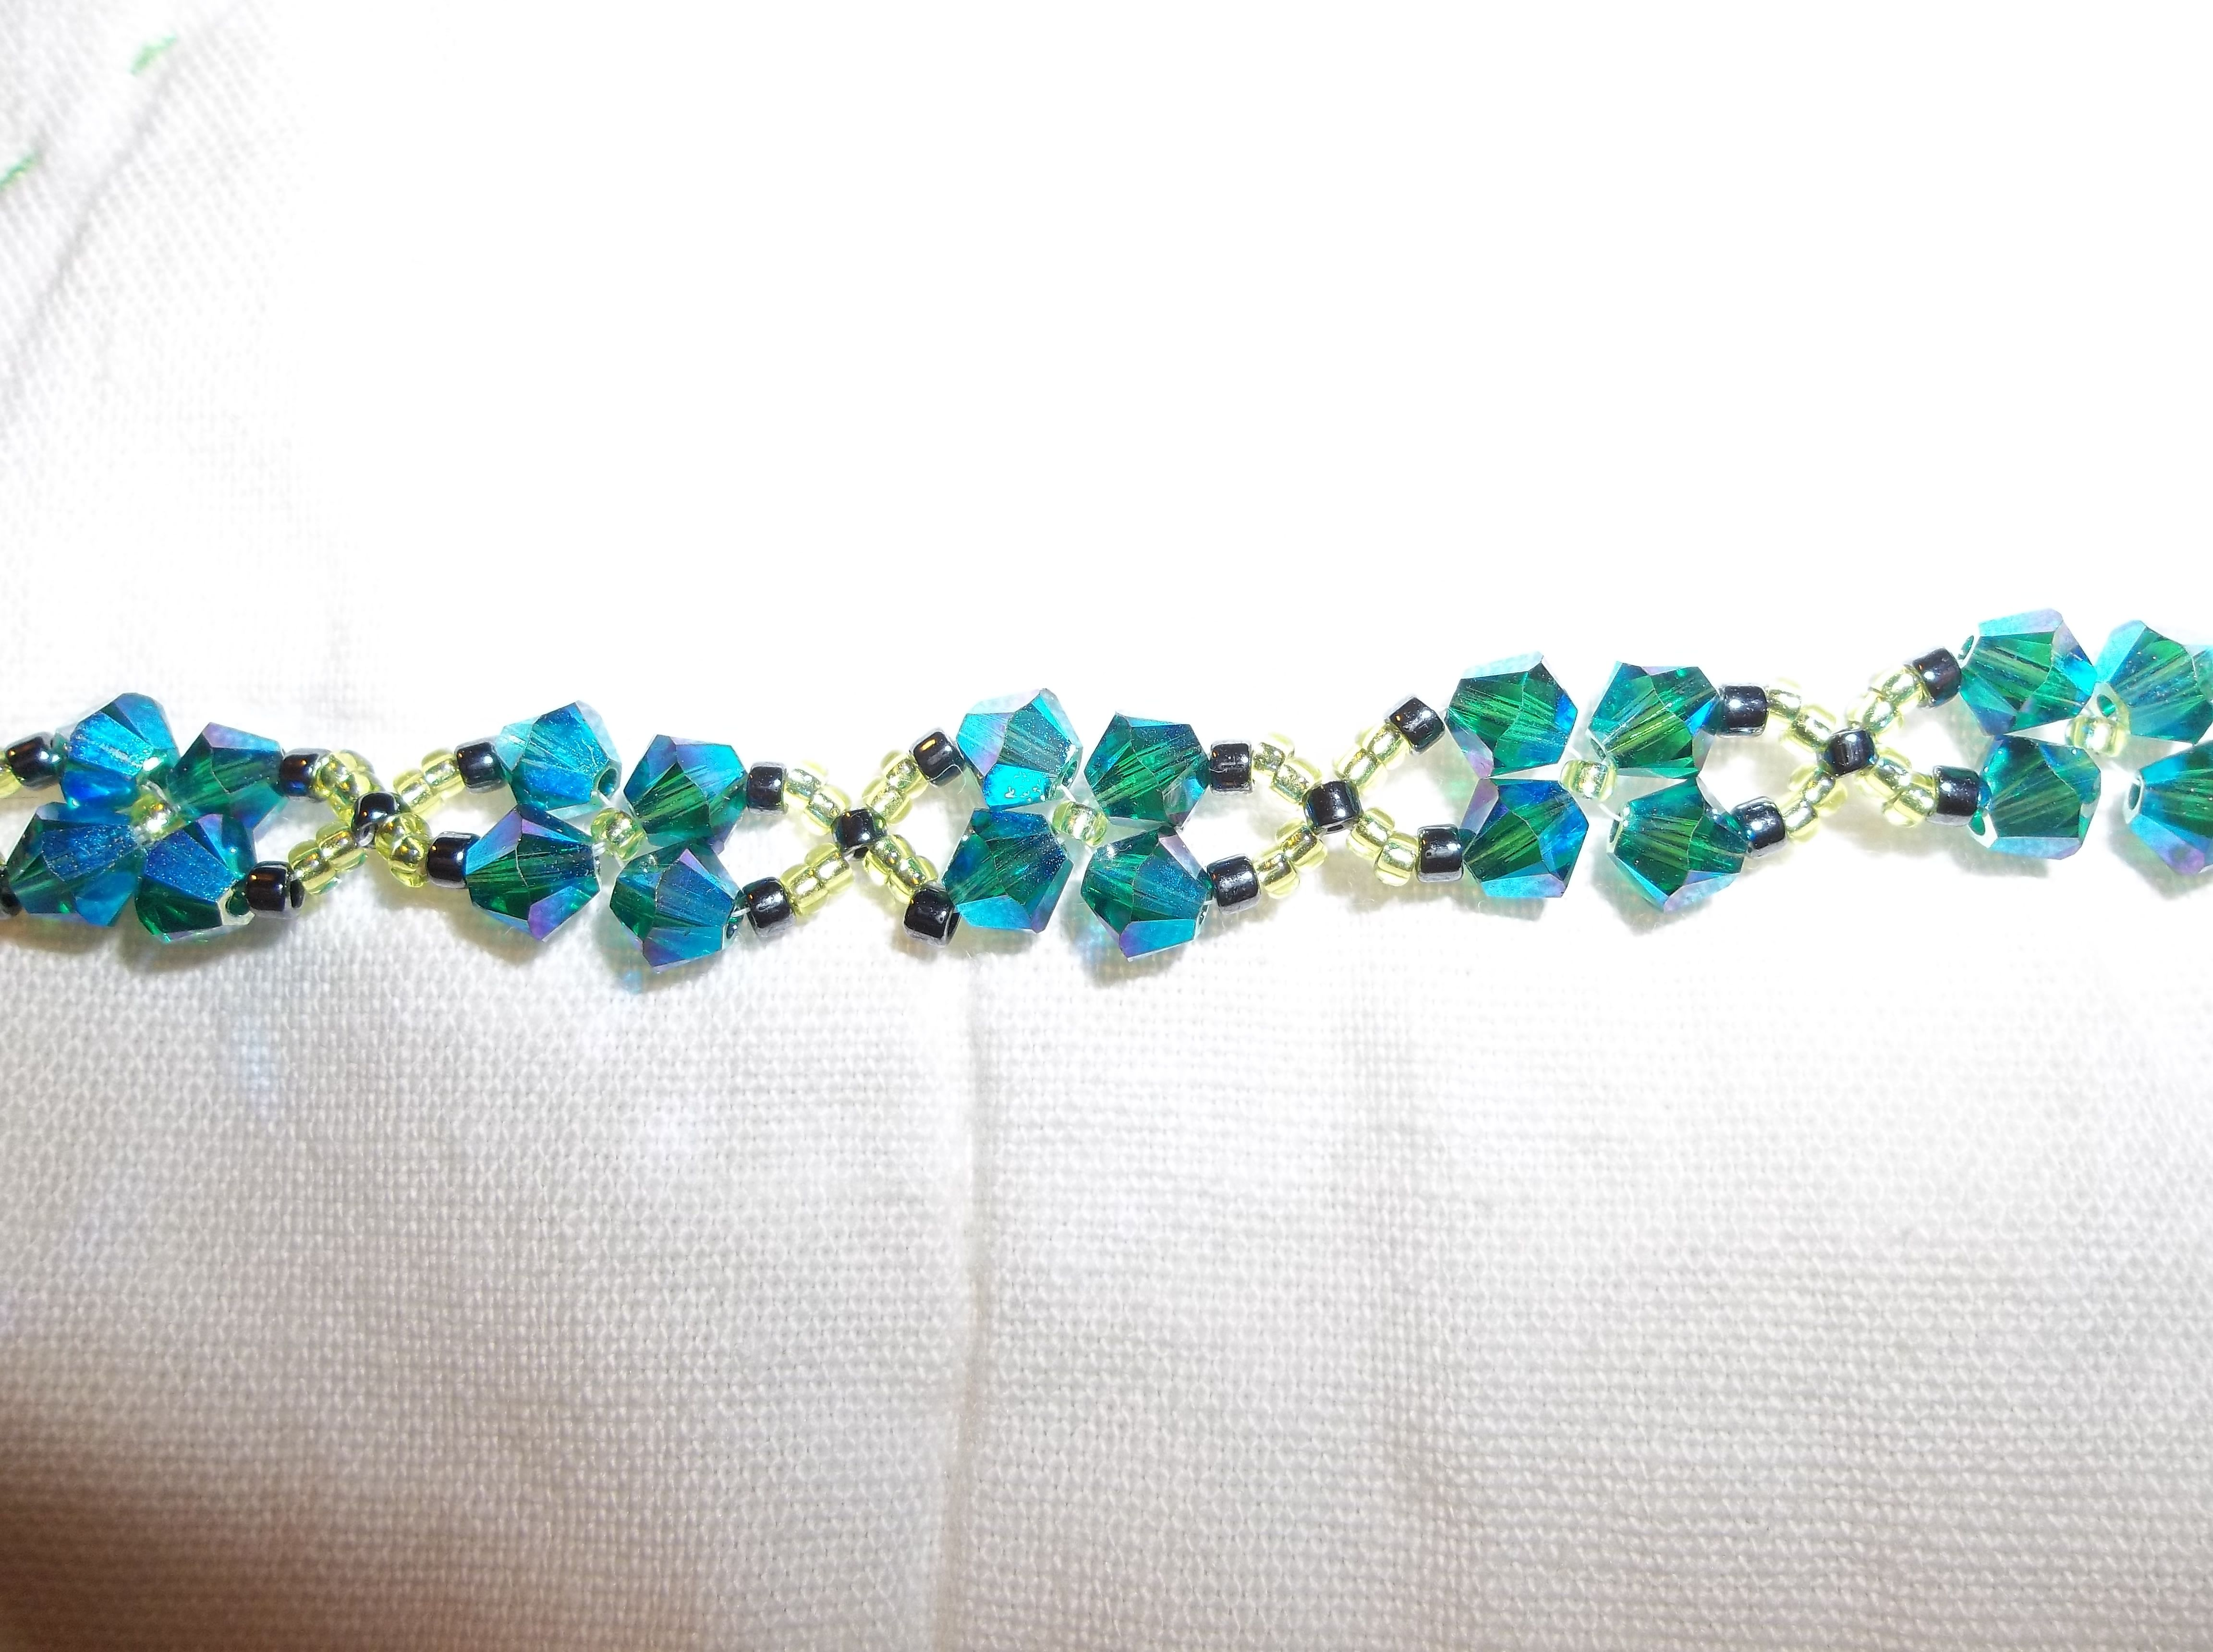 Another bracelet